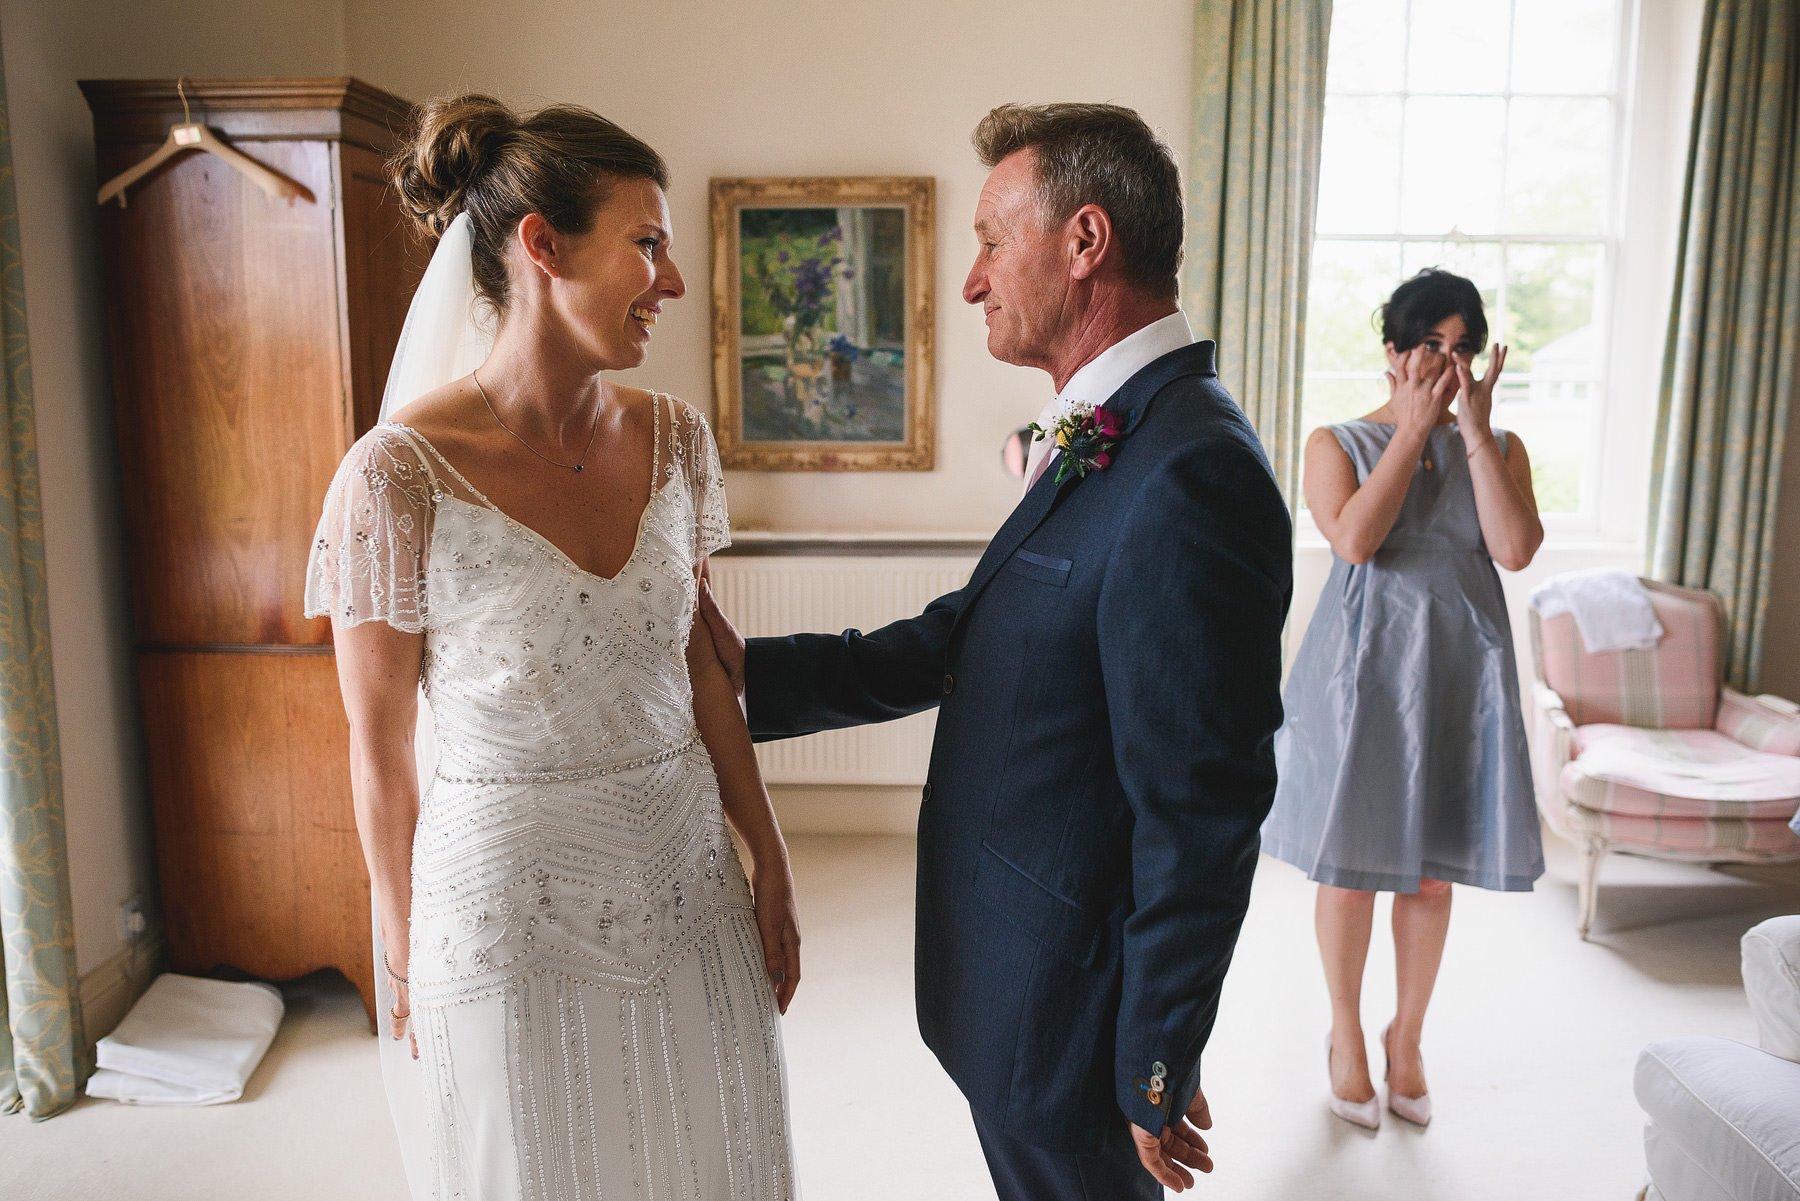 emotional dad on the wedding day at matara centre